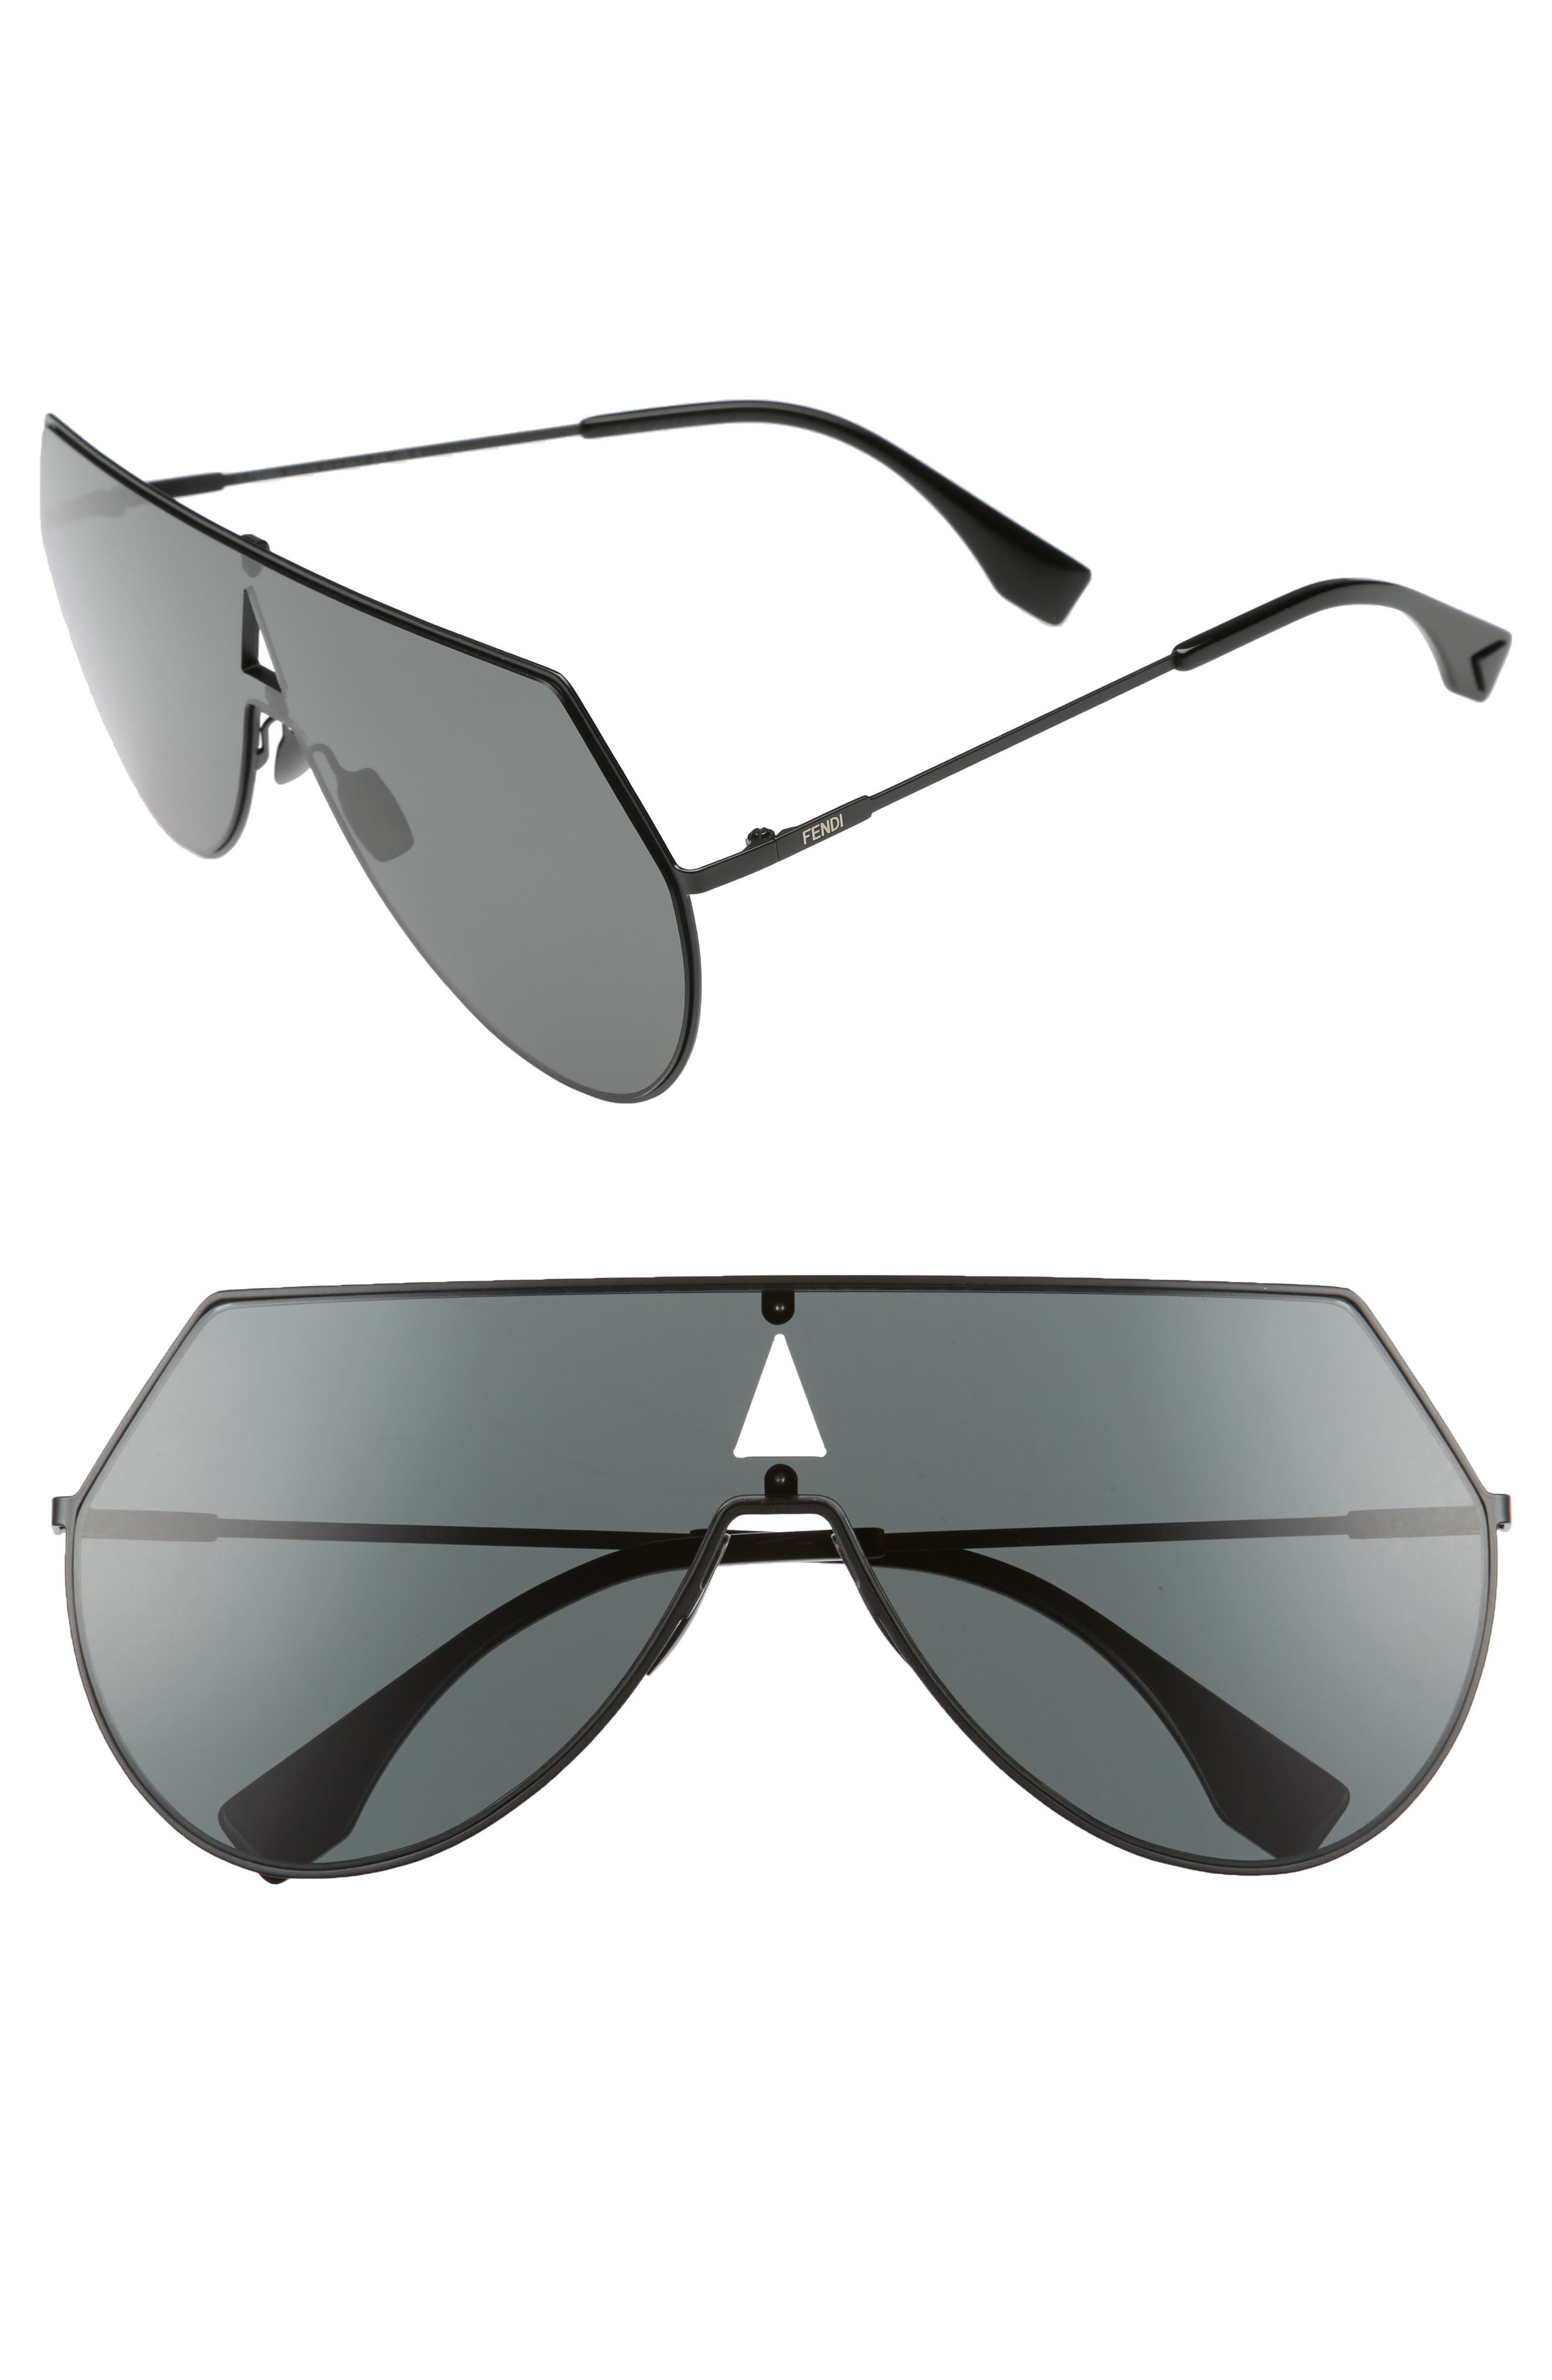 99mm Eyeline Aviator Sunglasses,                             Main thumbnail 1, color,                             Black